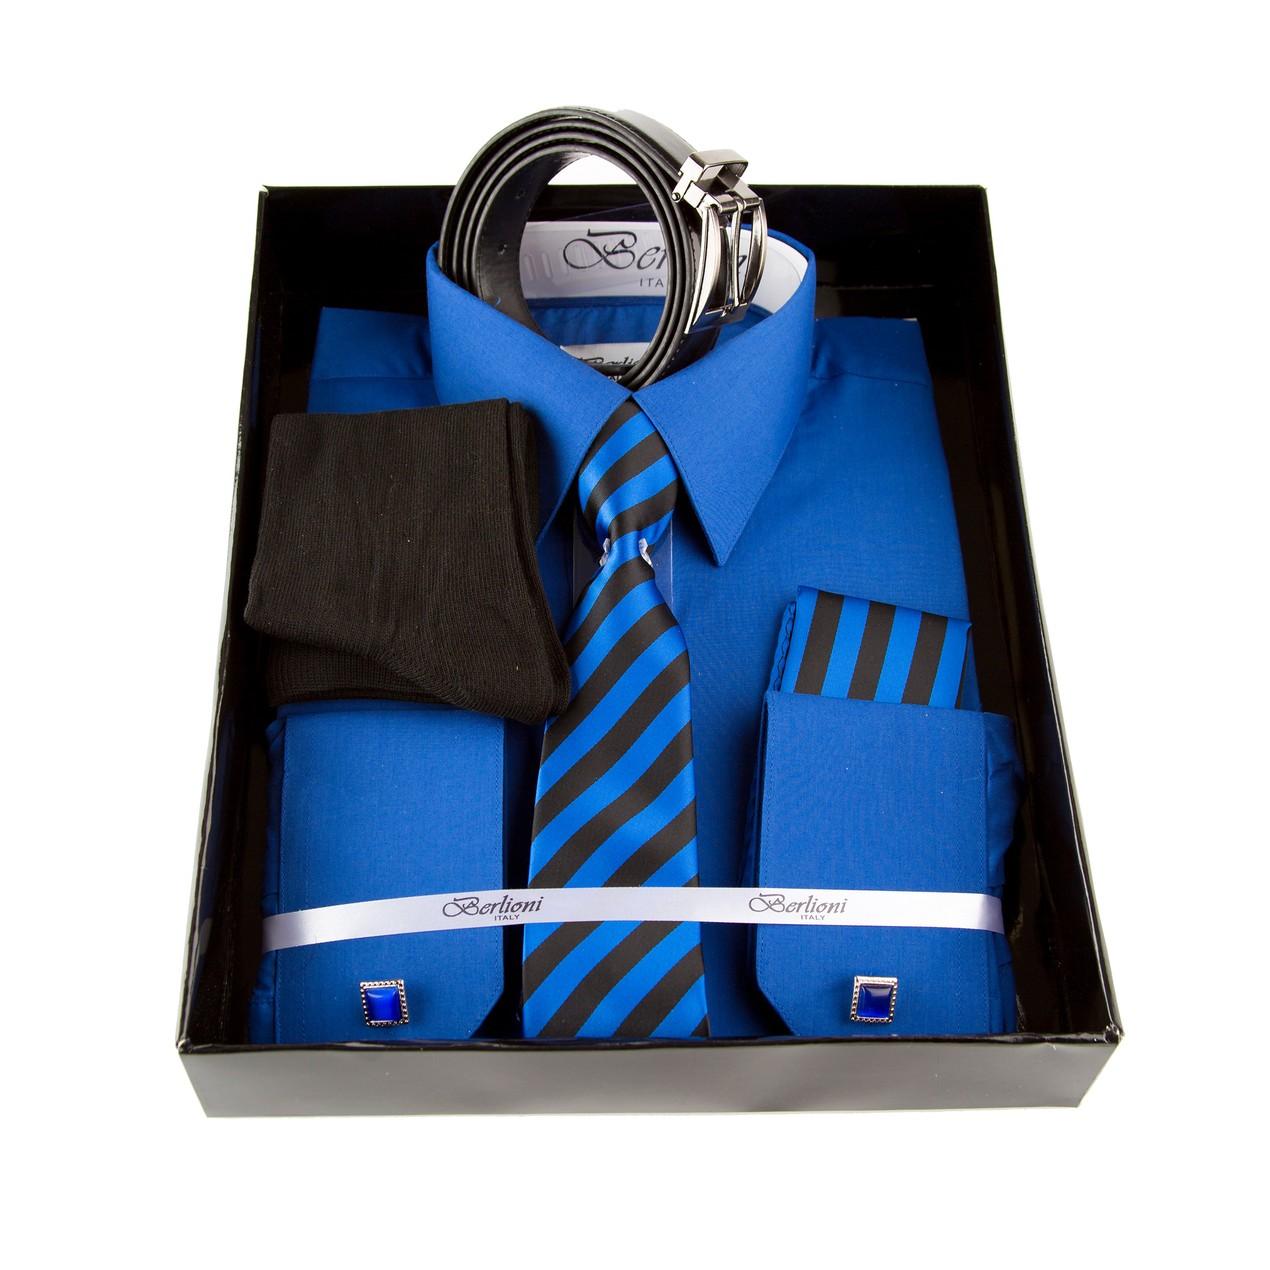 d8334fd7ca7 Berlioni Dress Shirt And Tie Set